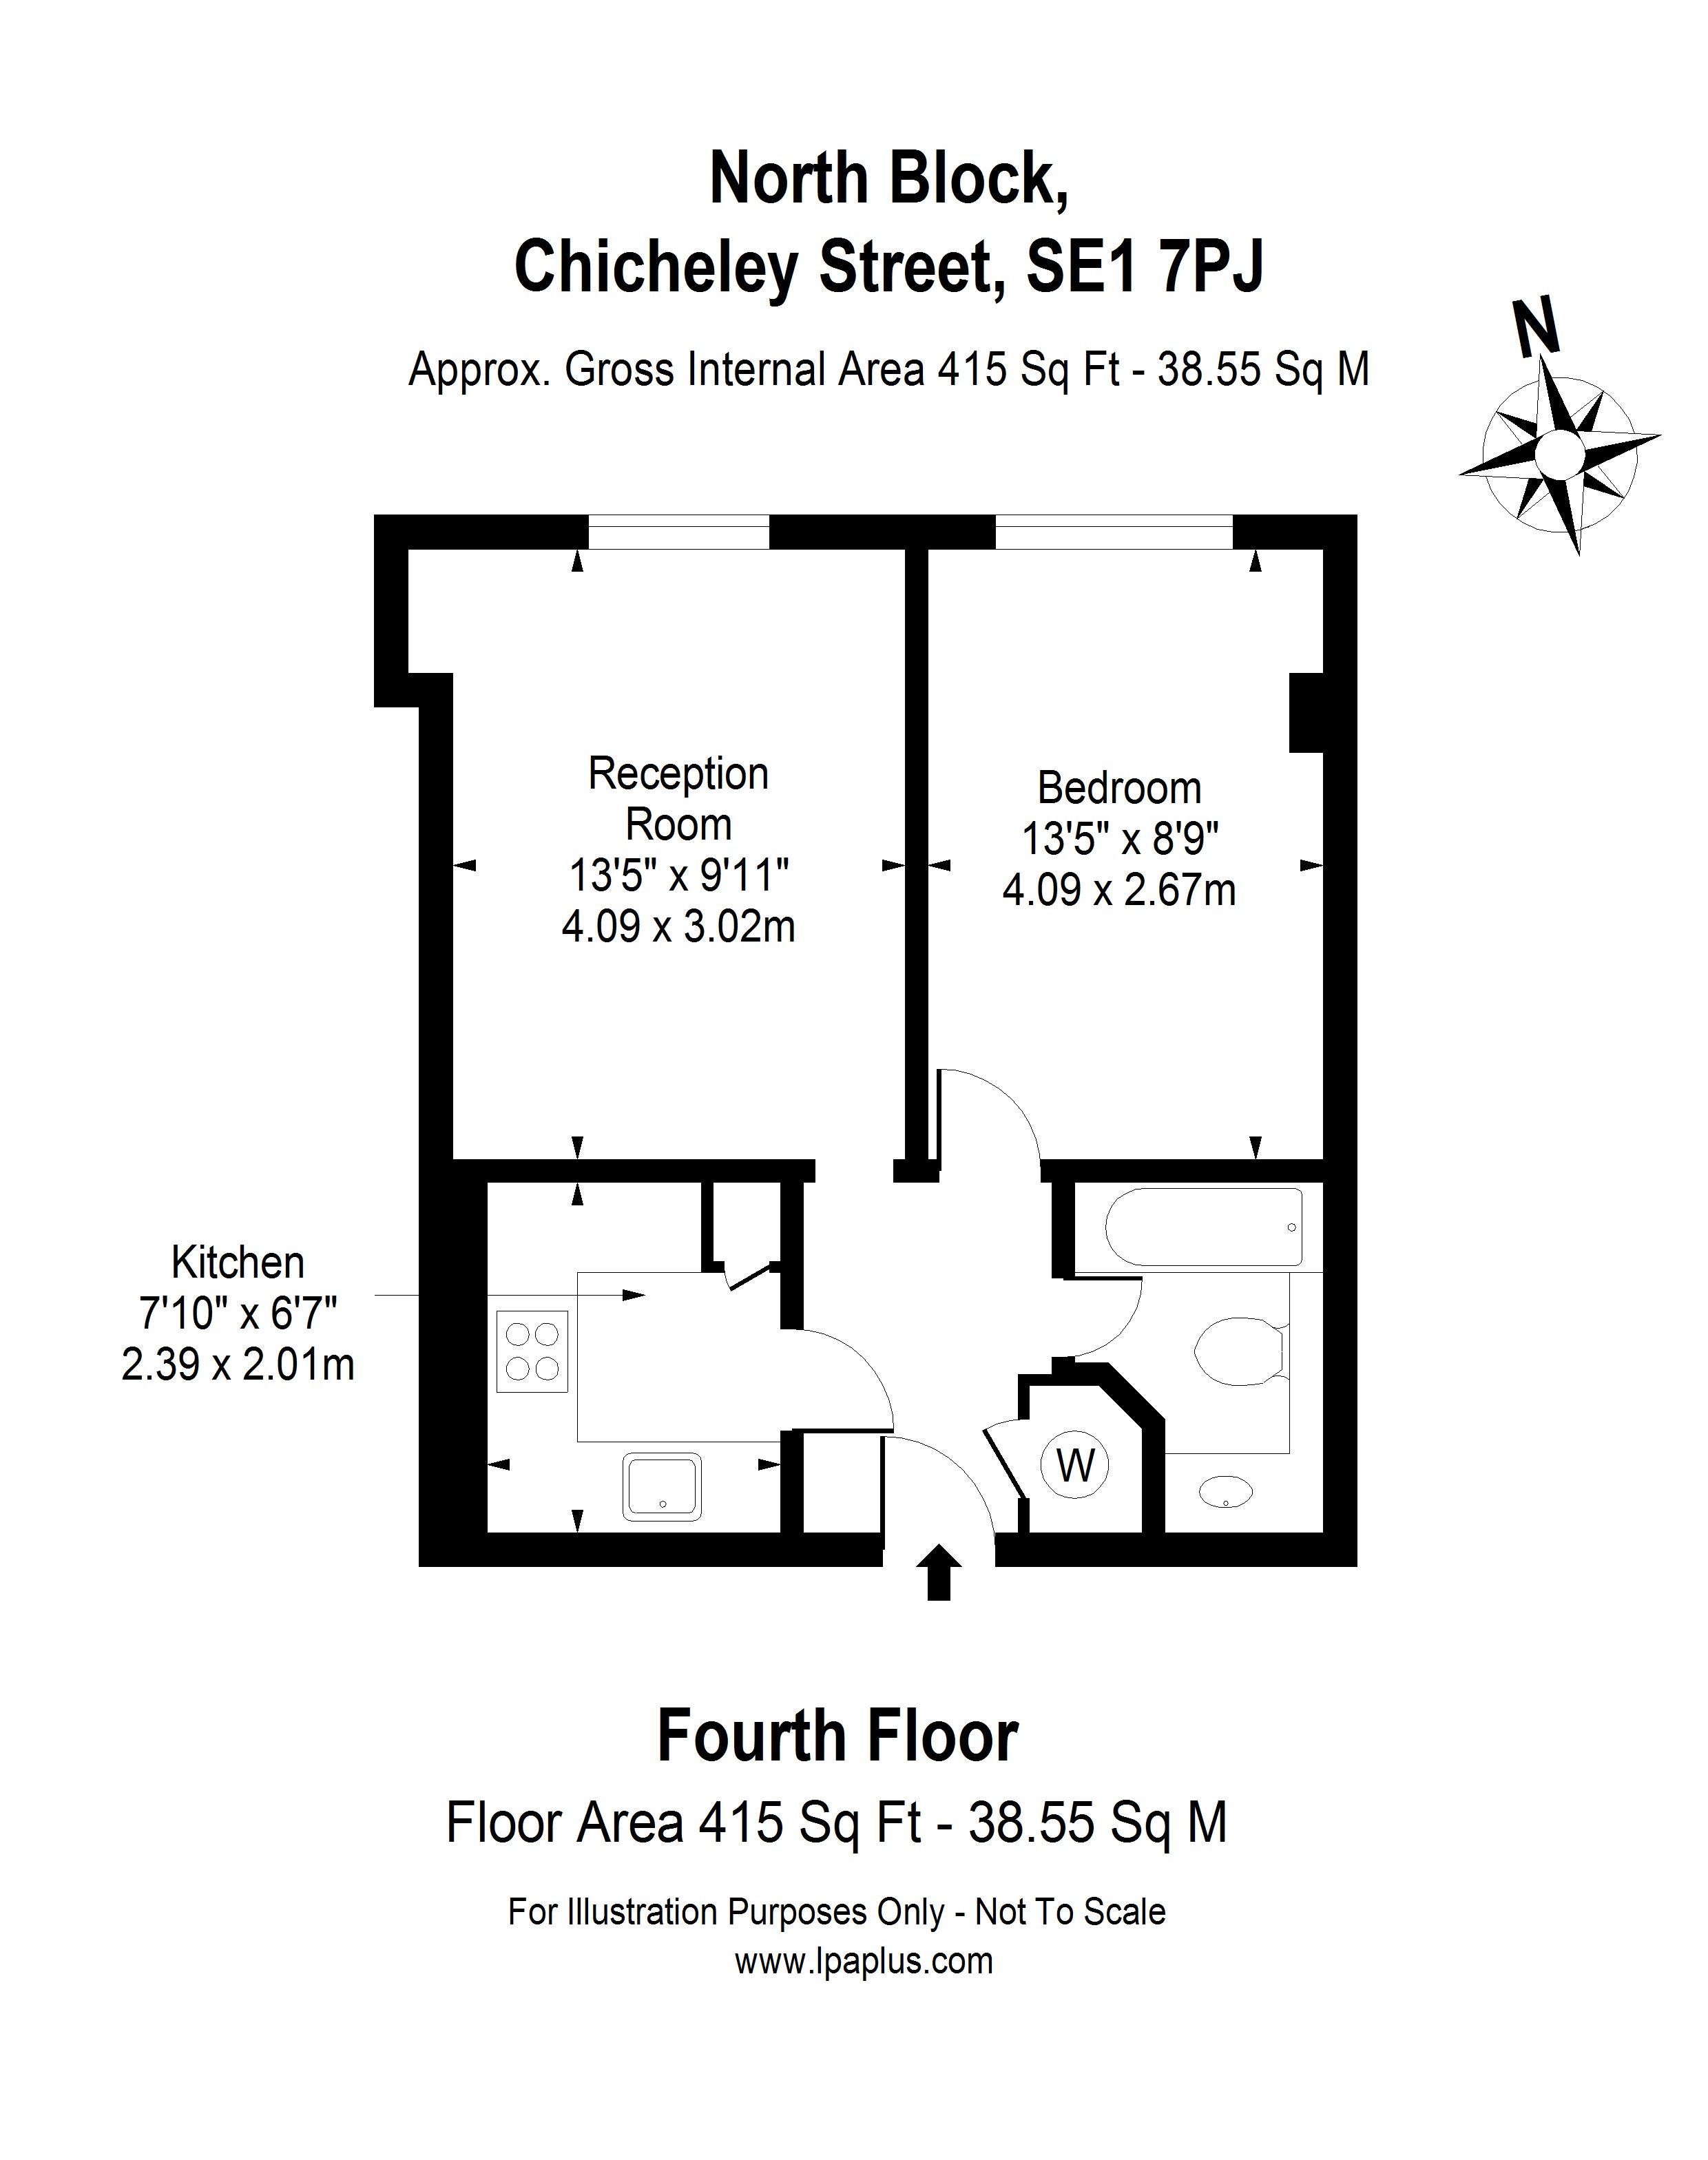 north-block-chinchley-street-southbank-se1-floorplan